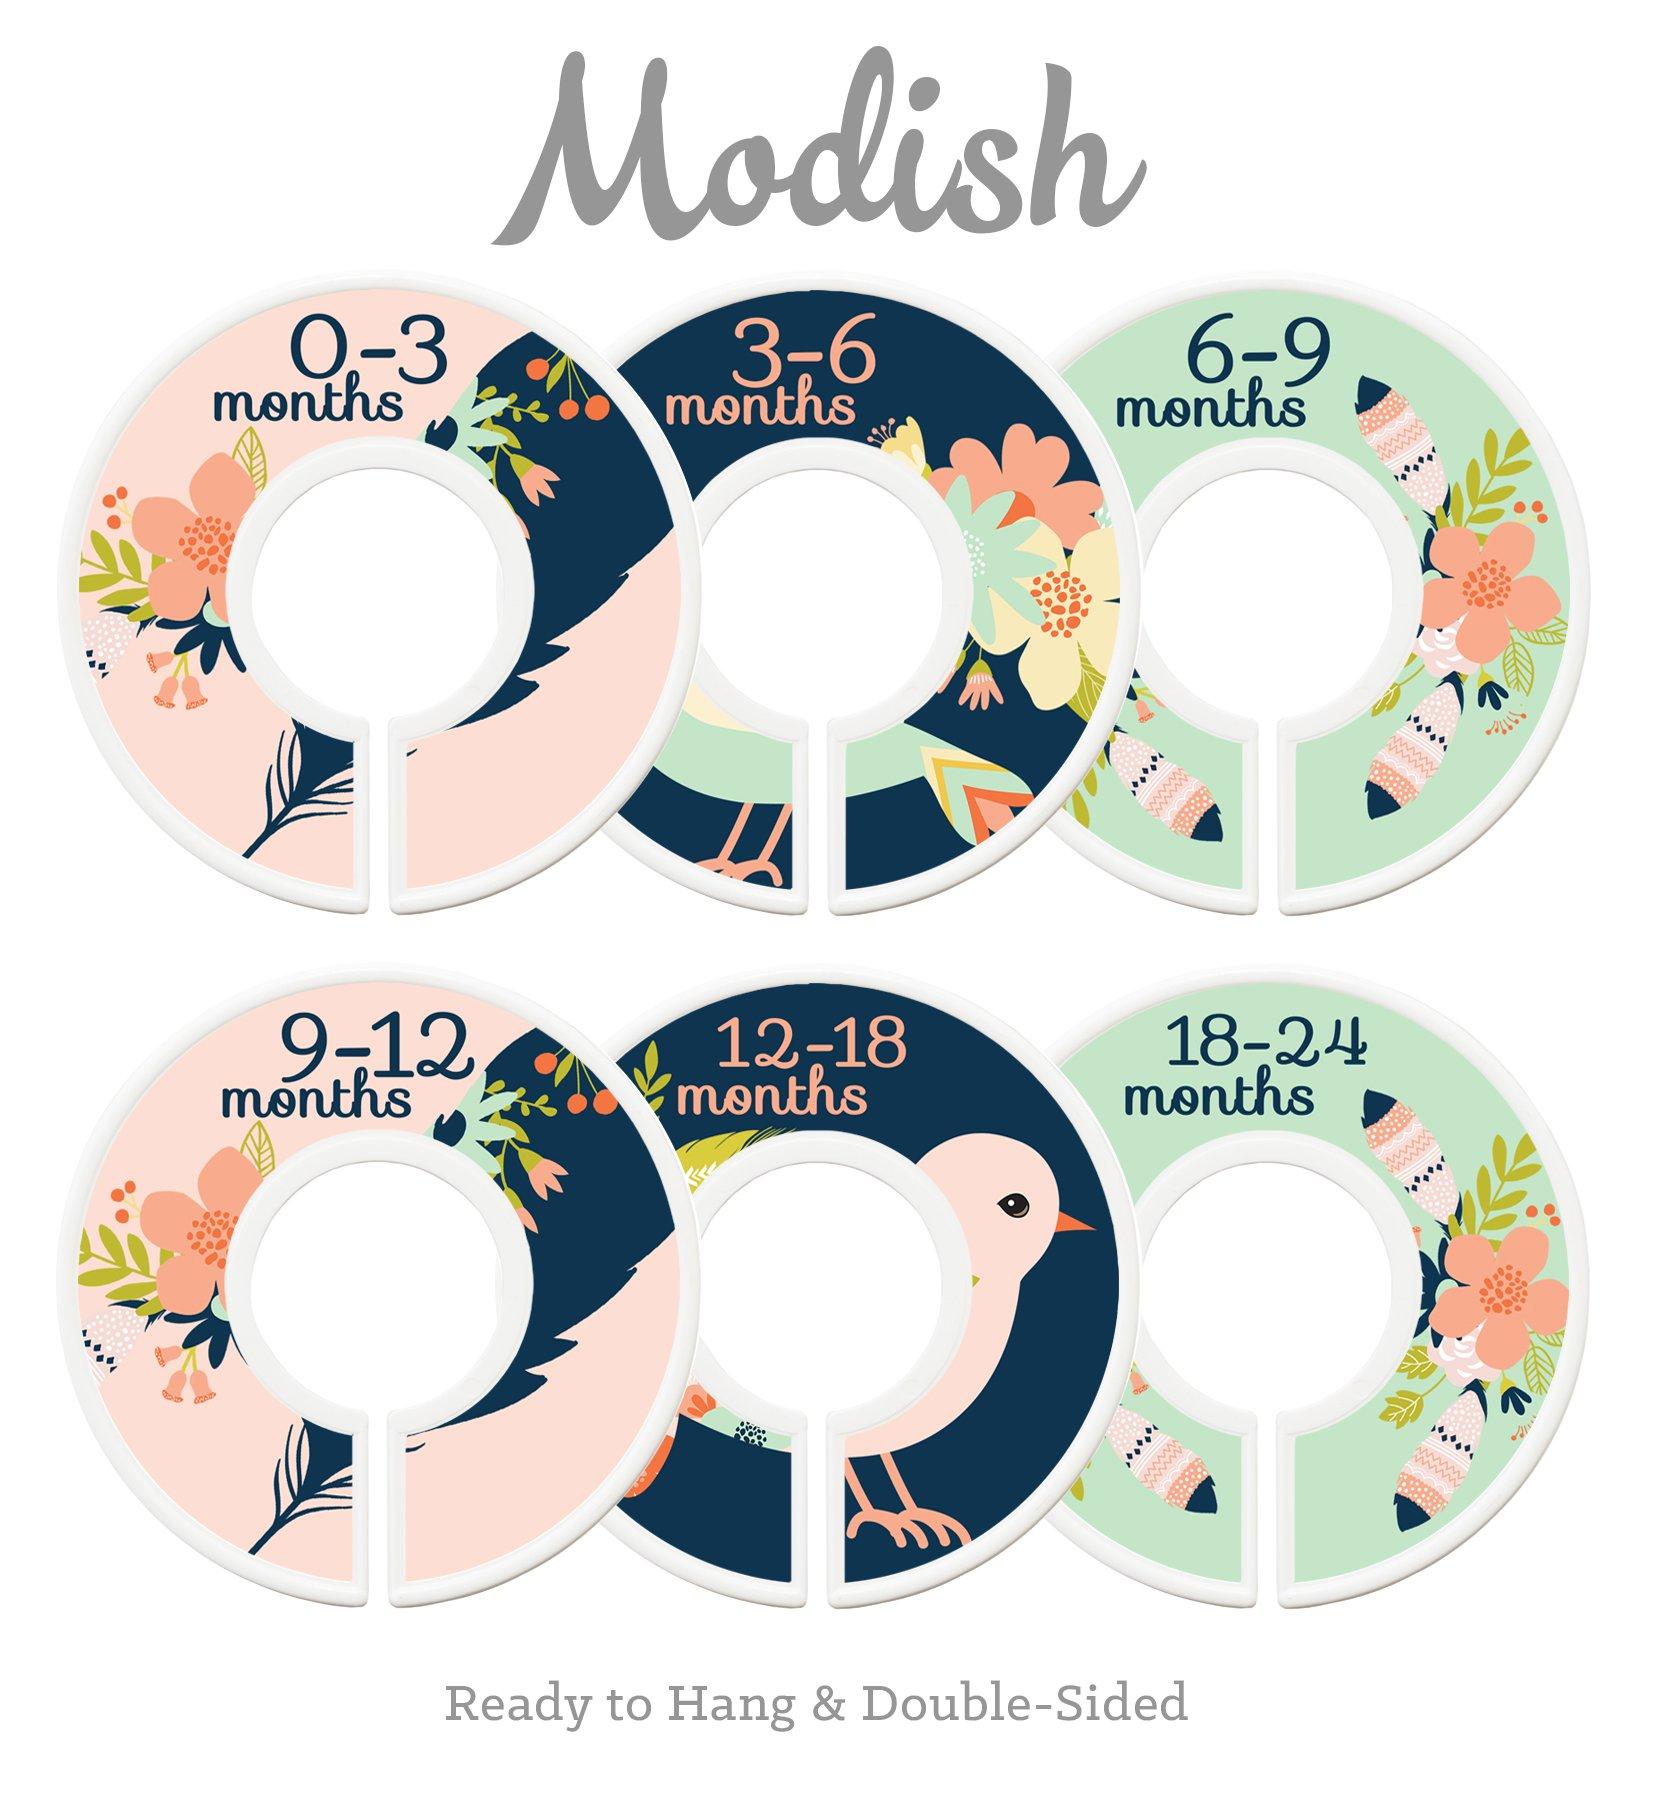 Modish Labels Baby Nursery Closet Dividers, Closet Organizers, Nursery Decor, Baby Girl, Birds, Flowers, Pink, Mint, Tribal